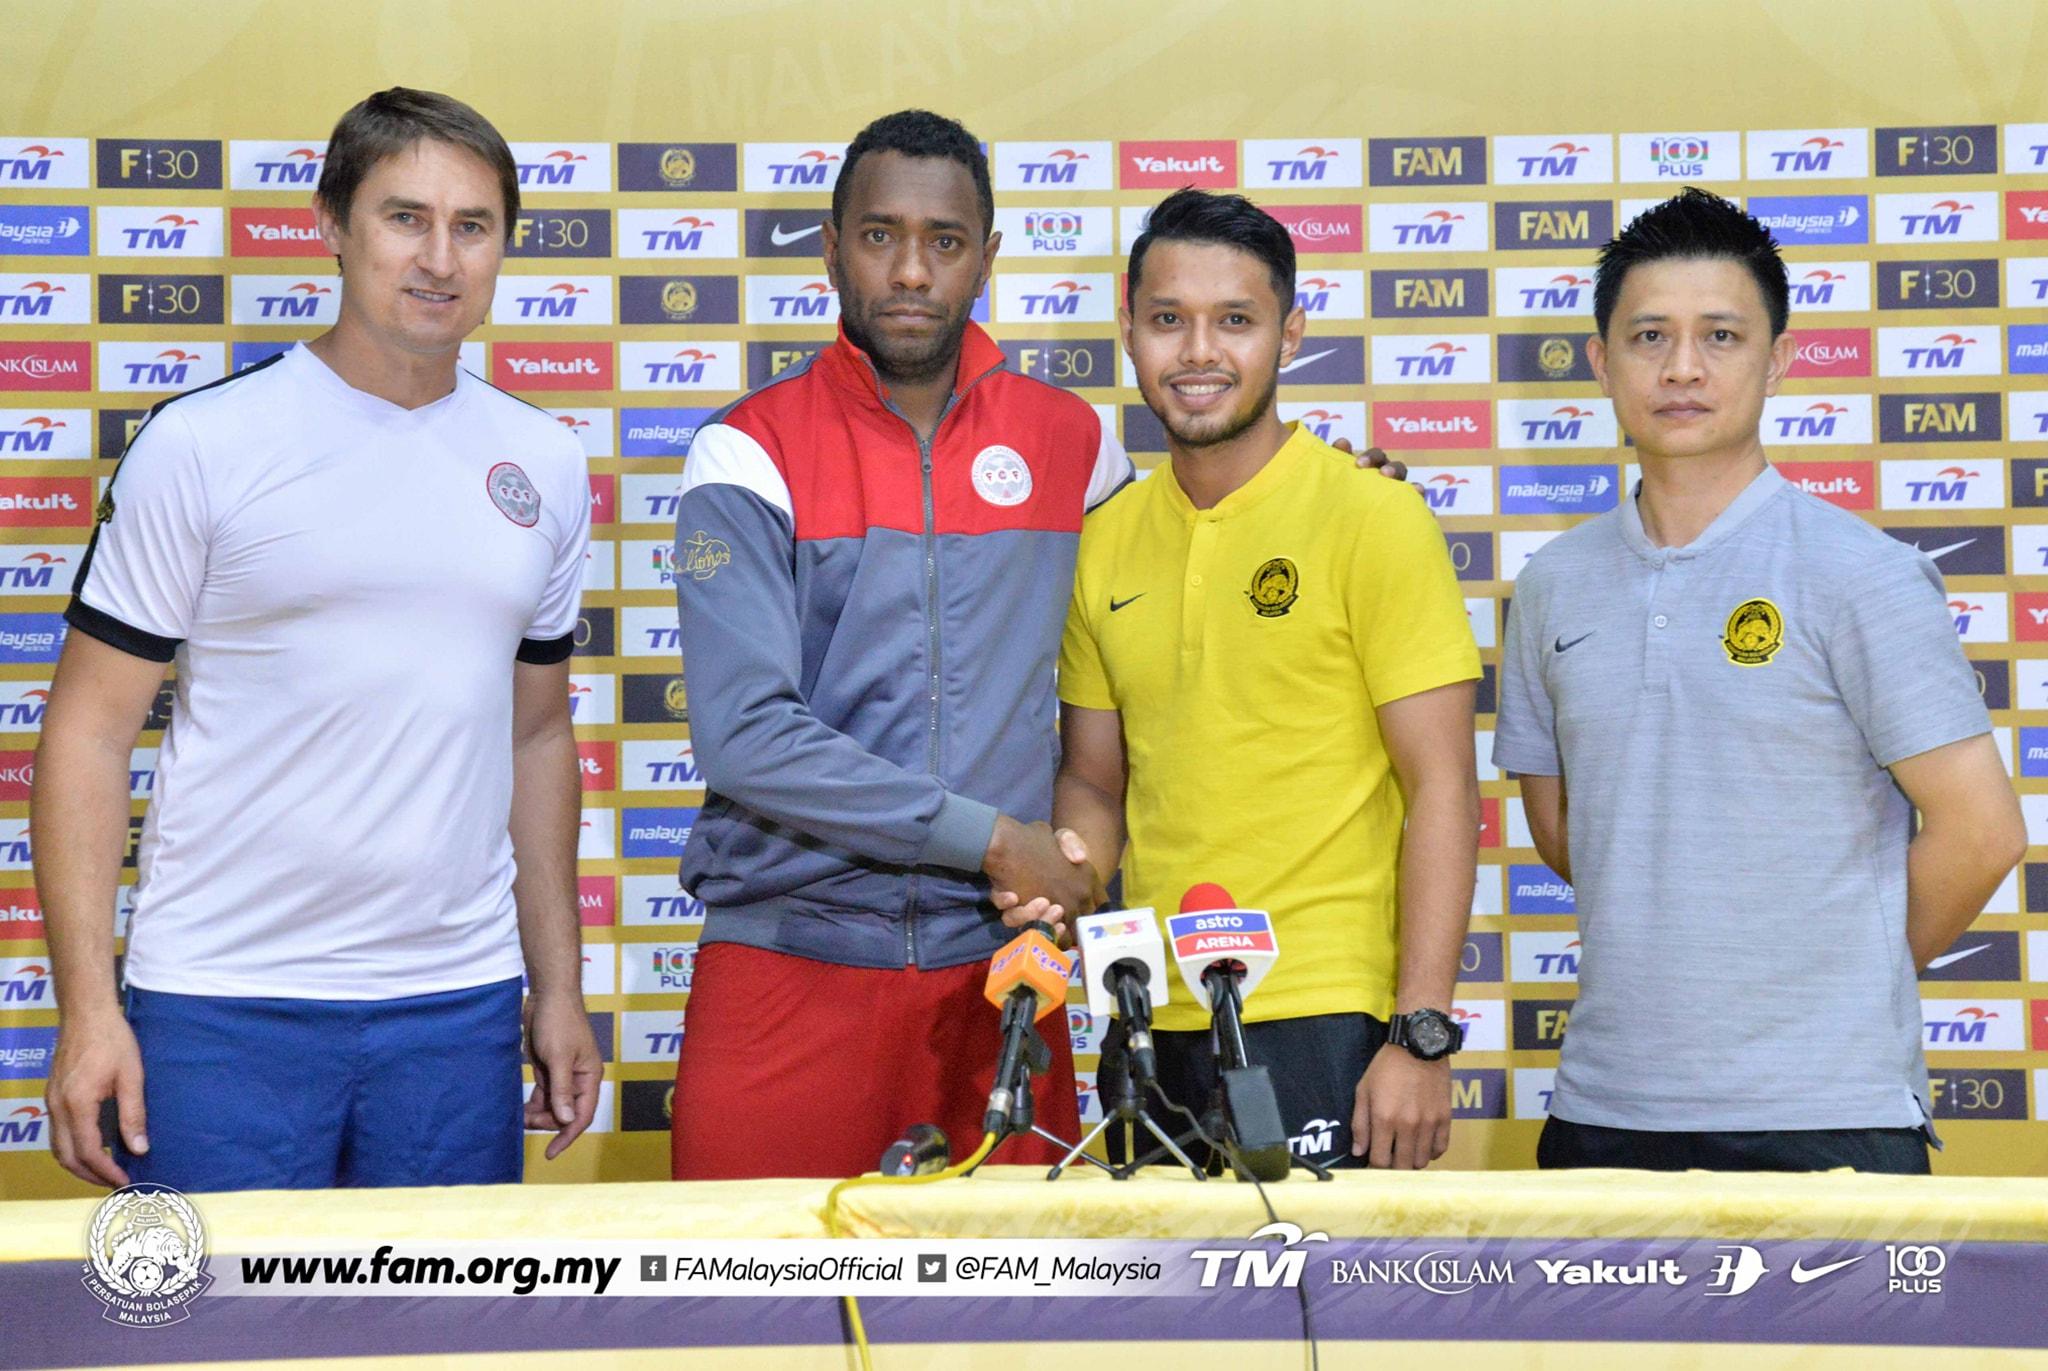 MALAISIE - NC : 5 - 0 (match 1) / Préparation Nation's Cup OFC FUTSAL